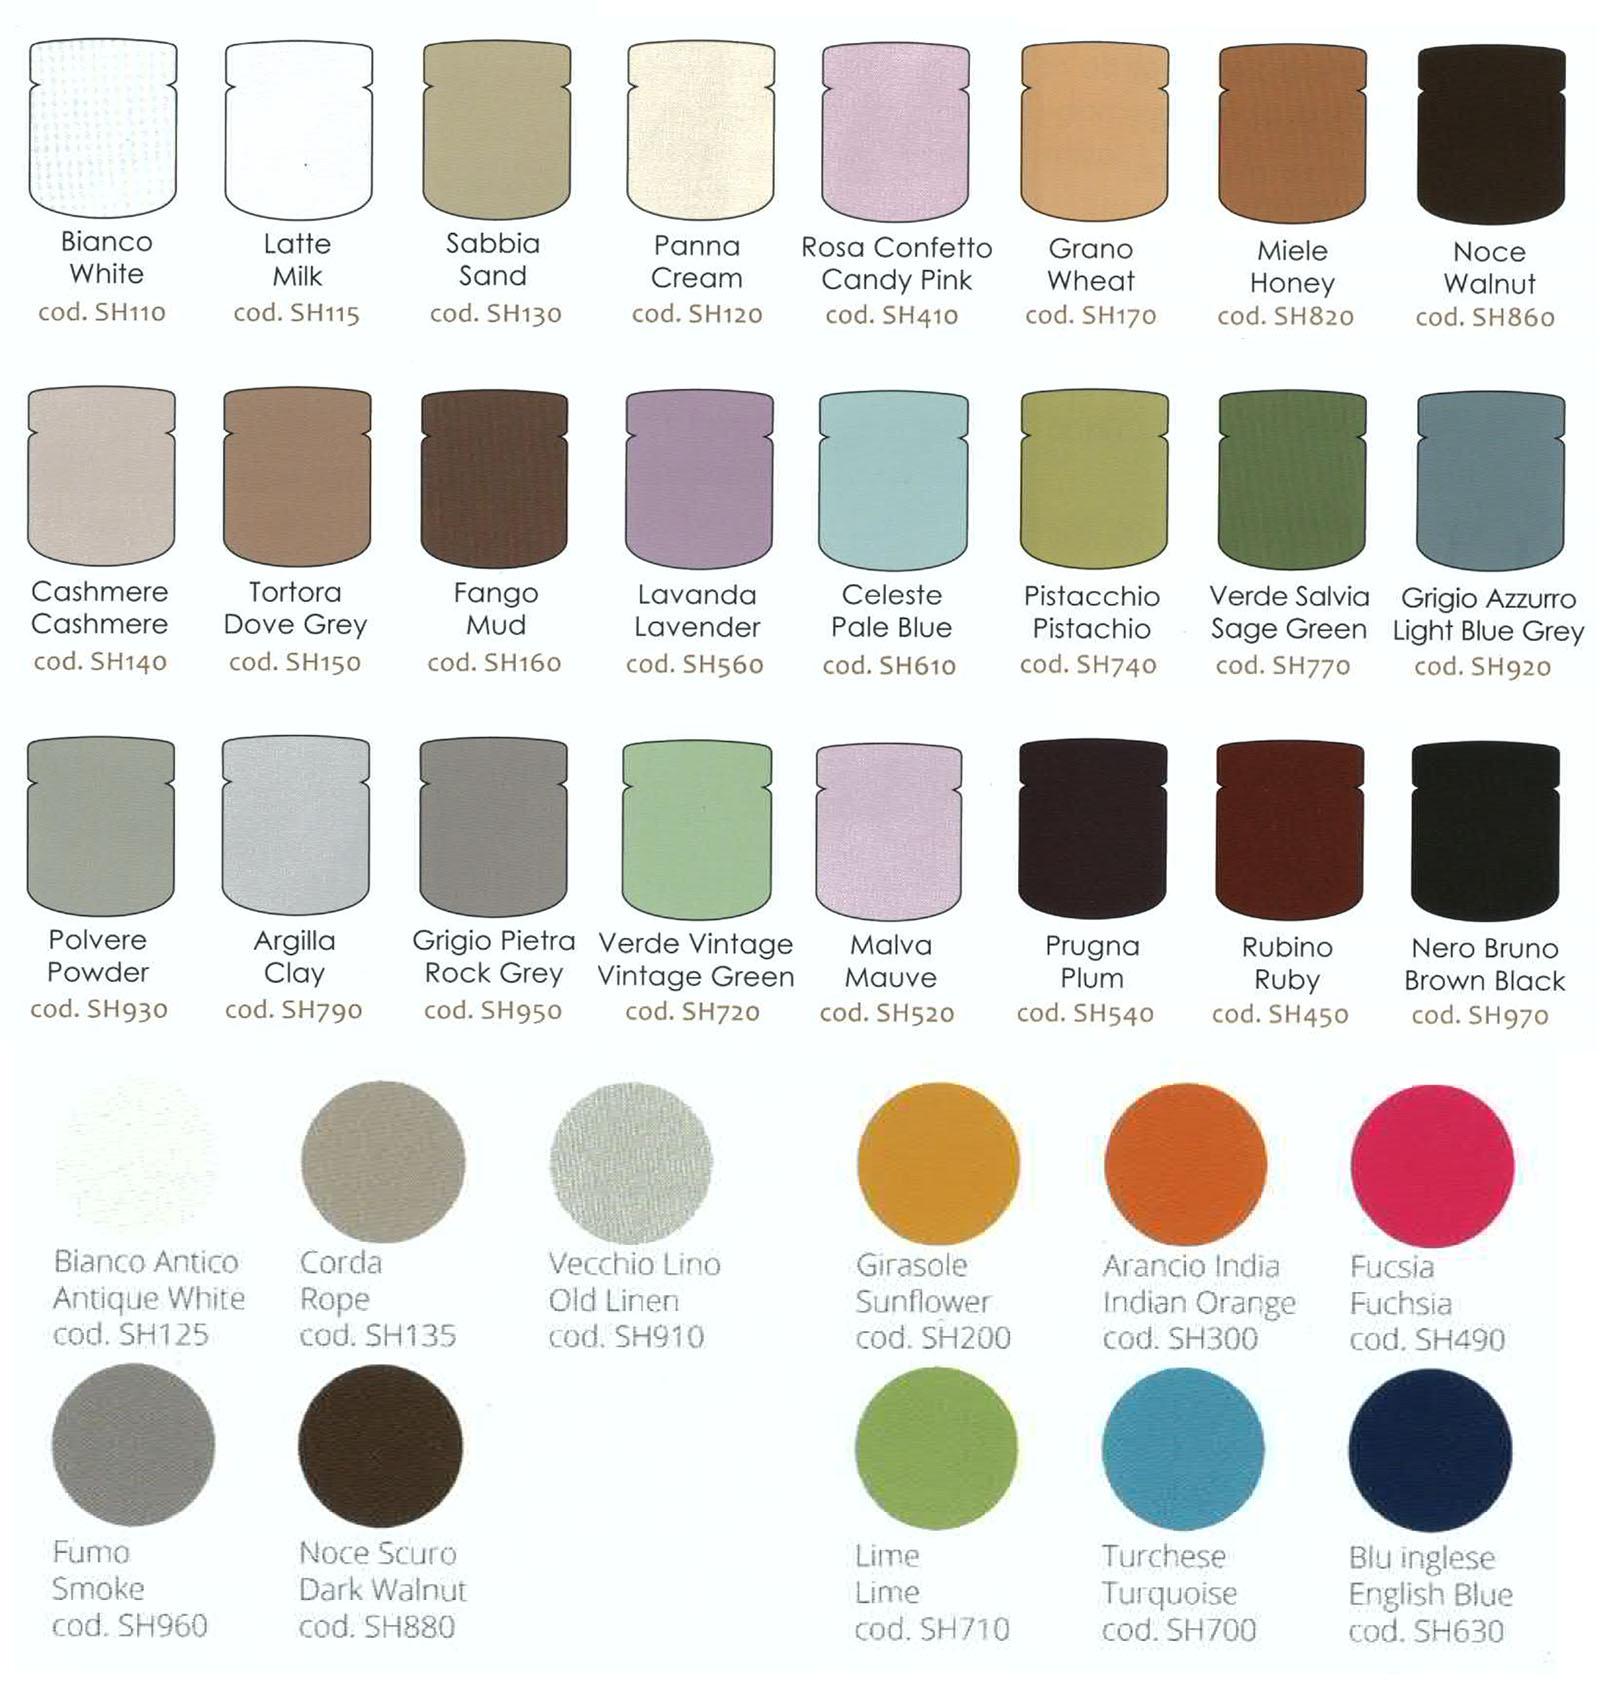 Inglese colori stunning scheda sui colori in inglese with inglese colori good colori in - Posso andare in bagno in inglese ...